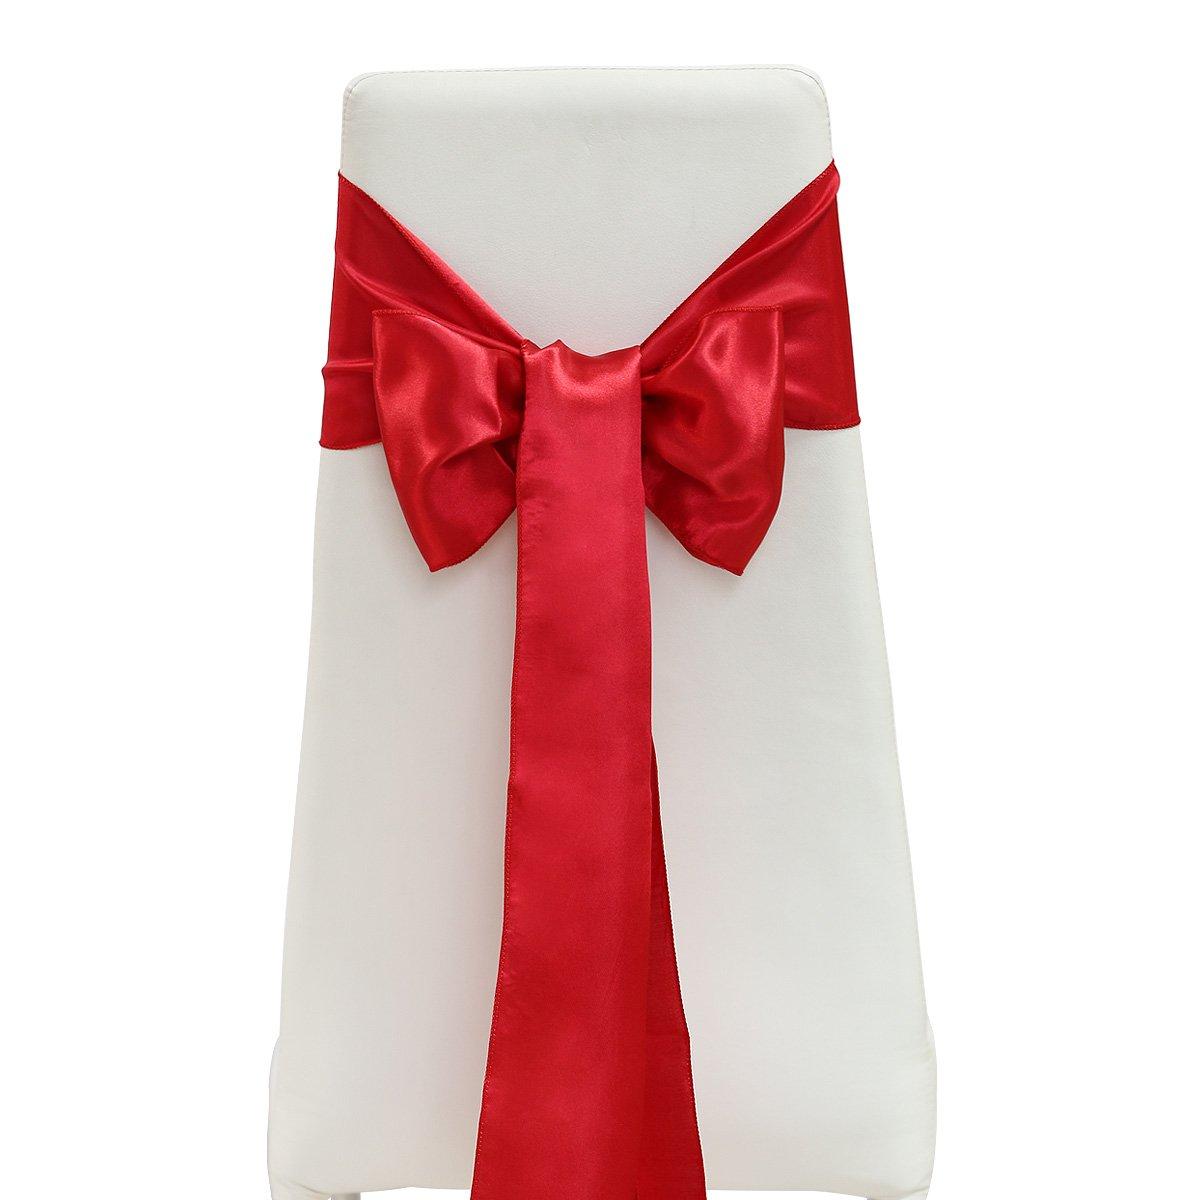 25er Rosso Sedia fiocco in raso fiocco stuhlhussen nastri matrimonio tischleufer Party ADDOBBI